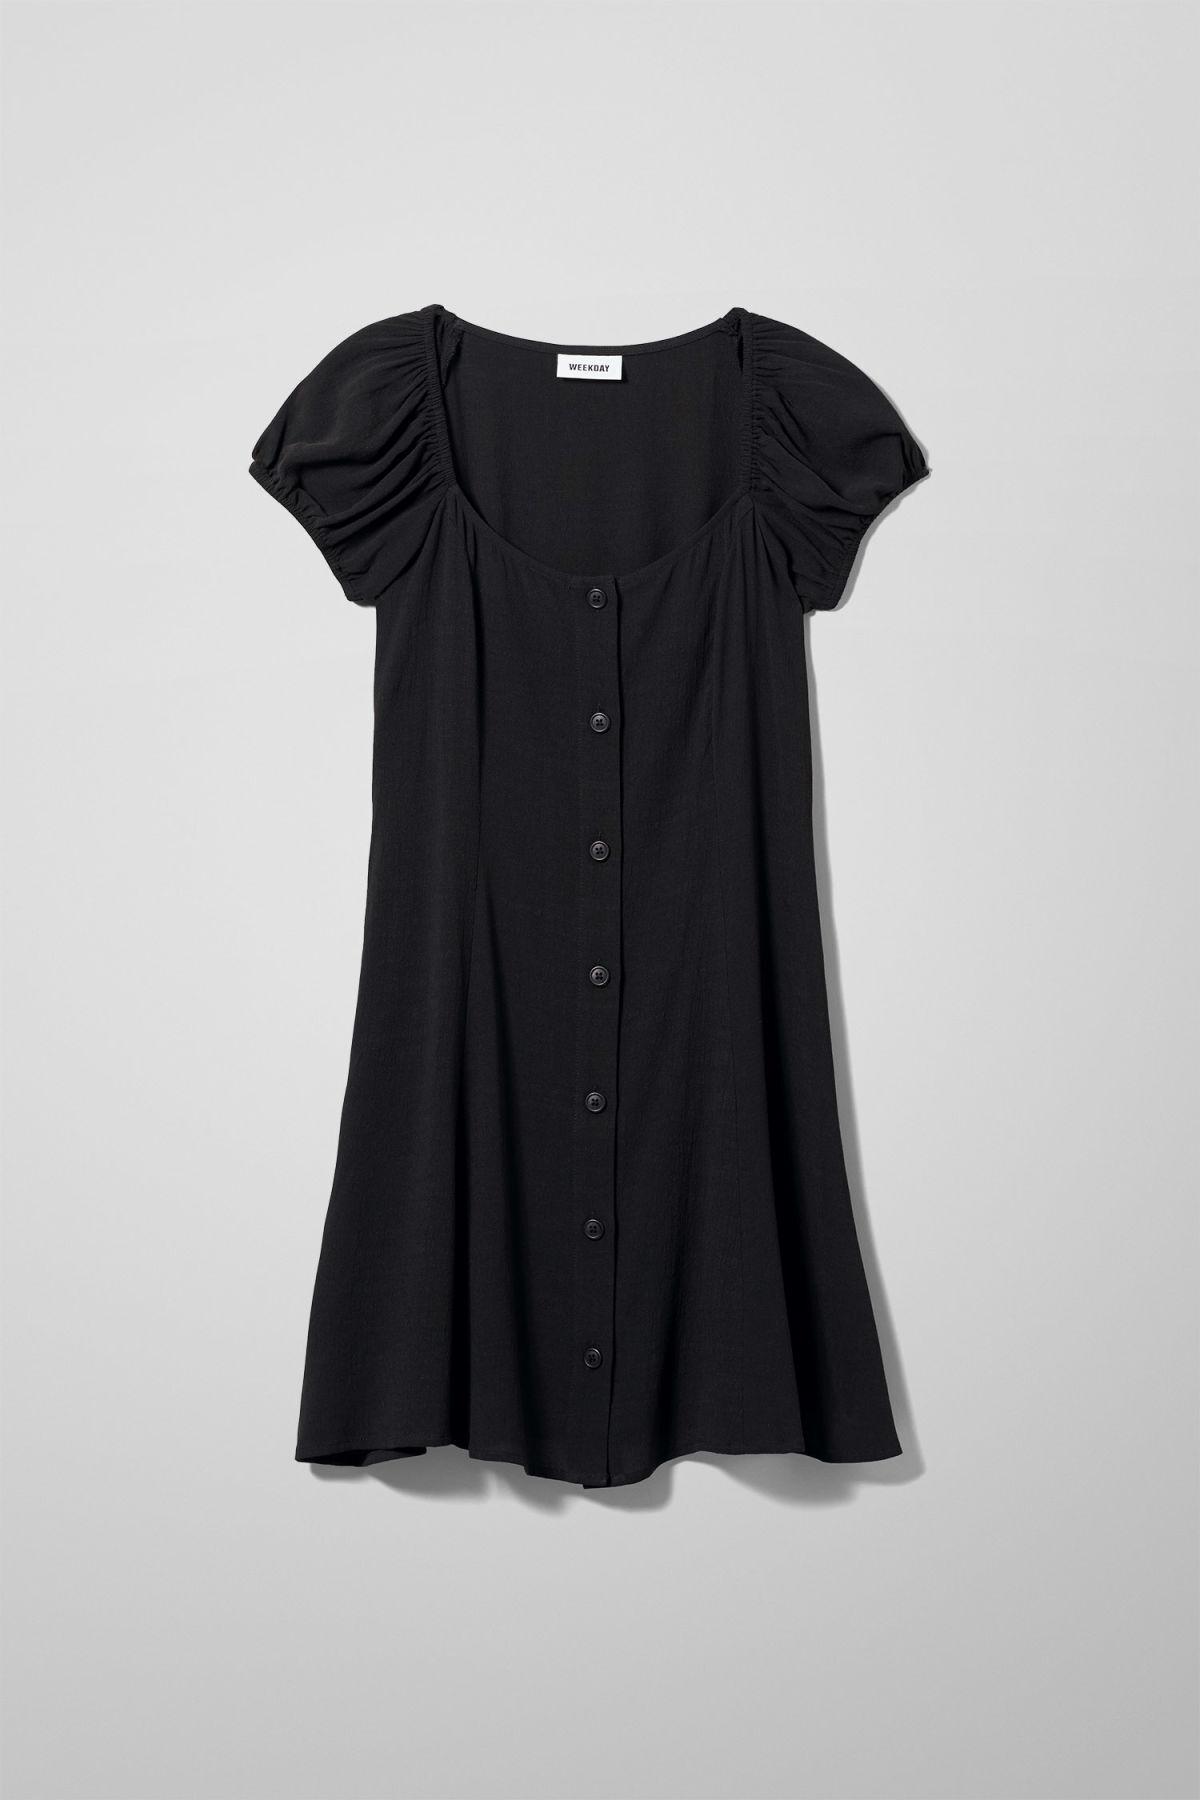 Image of Mina Dress - Black-34